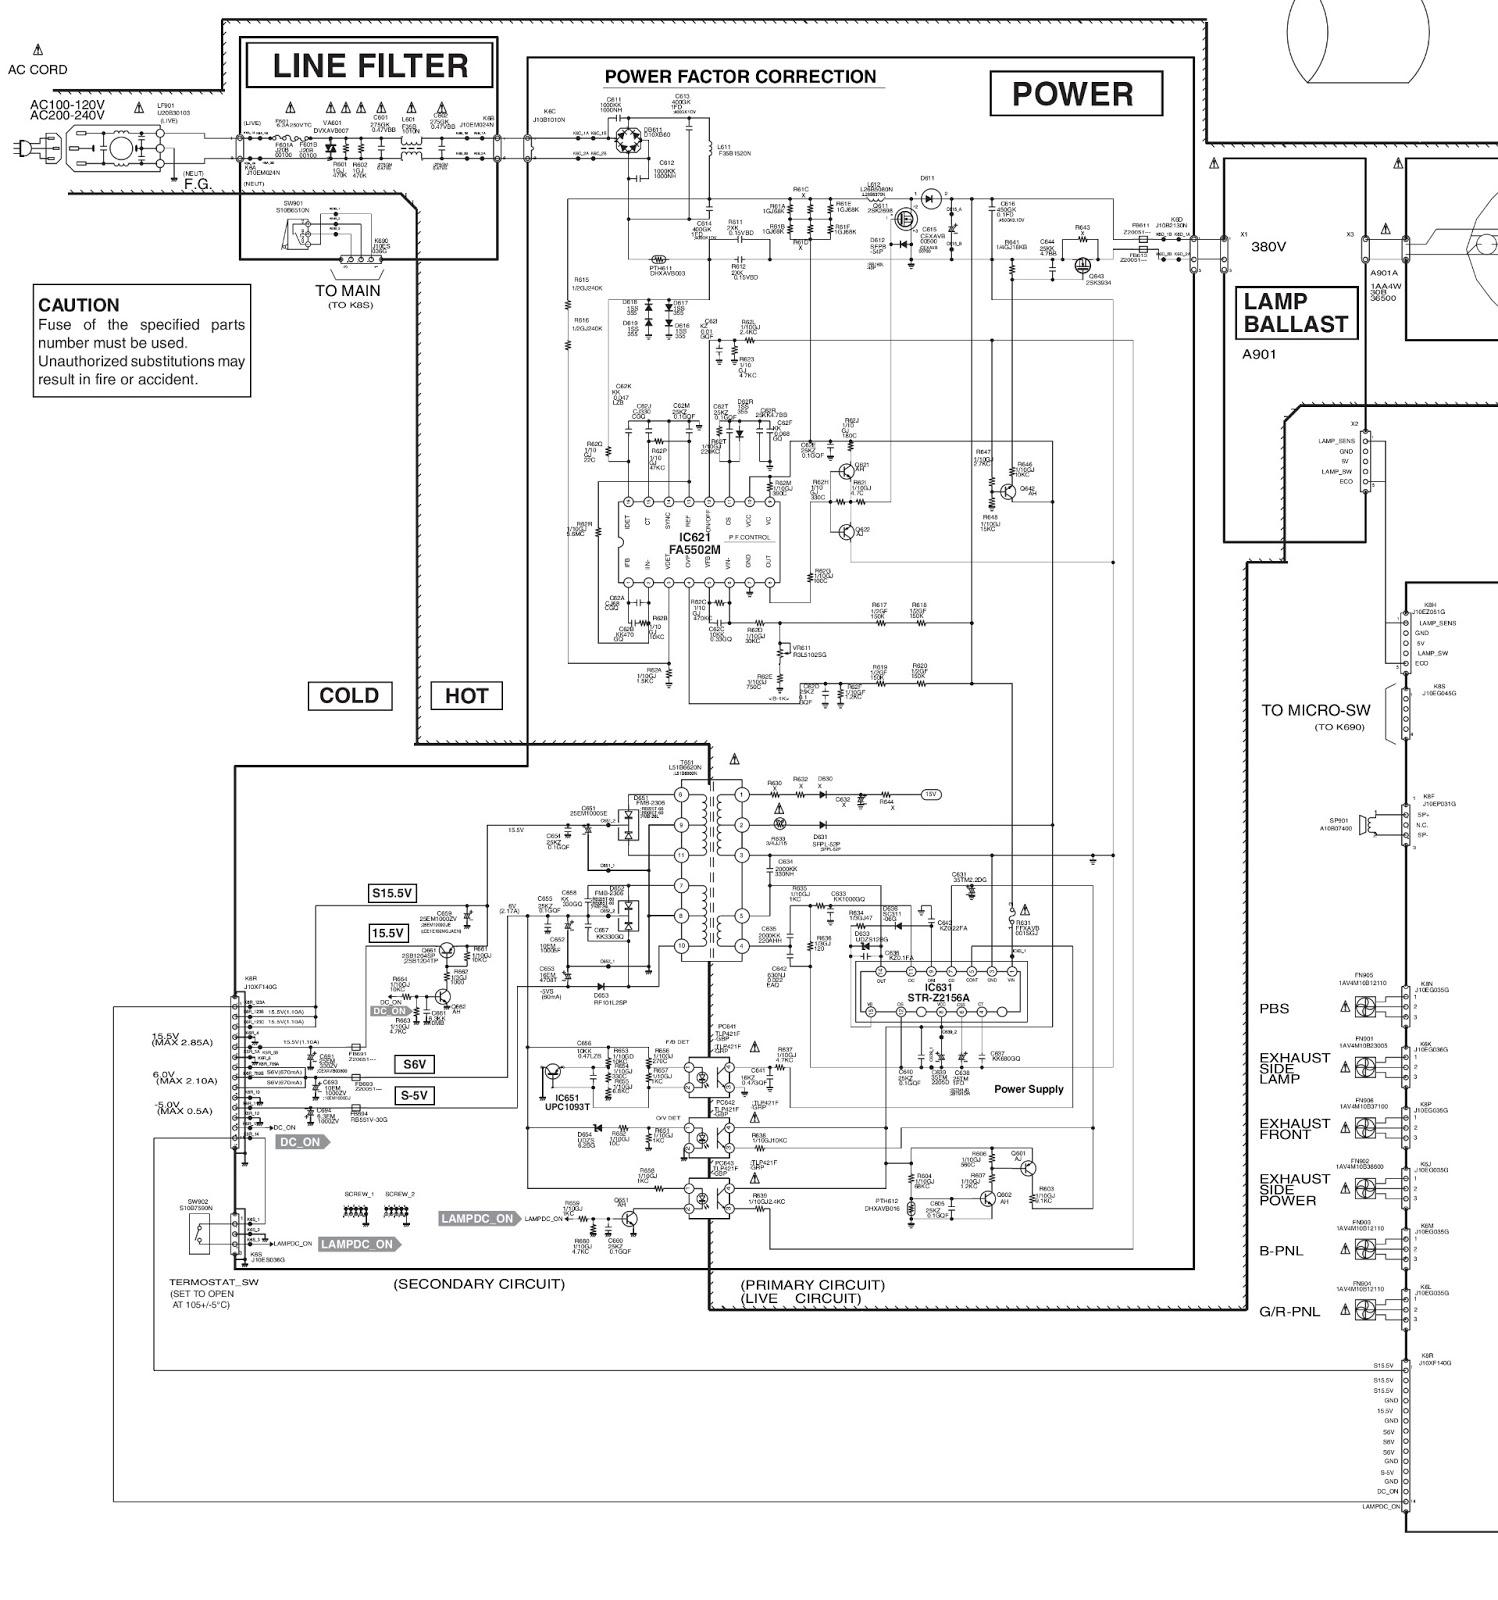 how to draw plc wiring diagram jeep wrangler radio sanyo xu87 projector power supply schematic